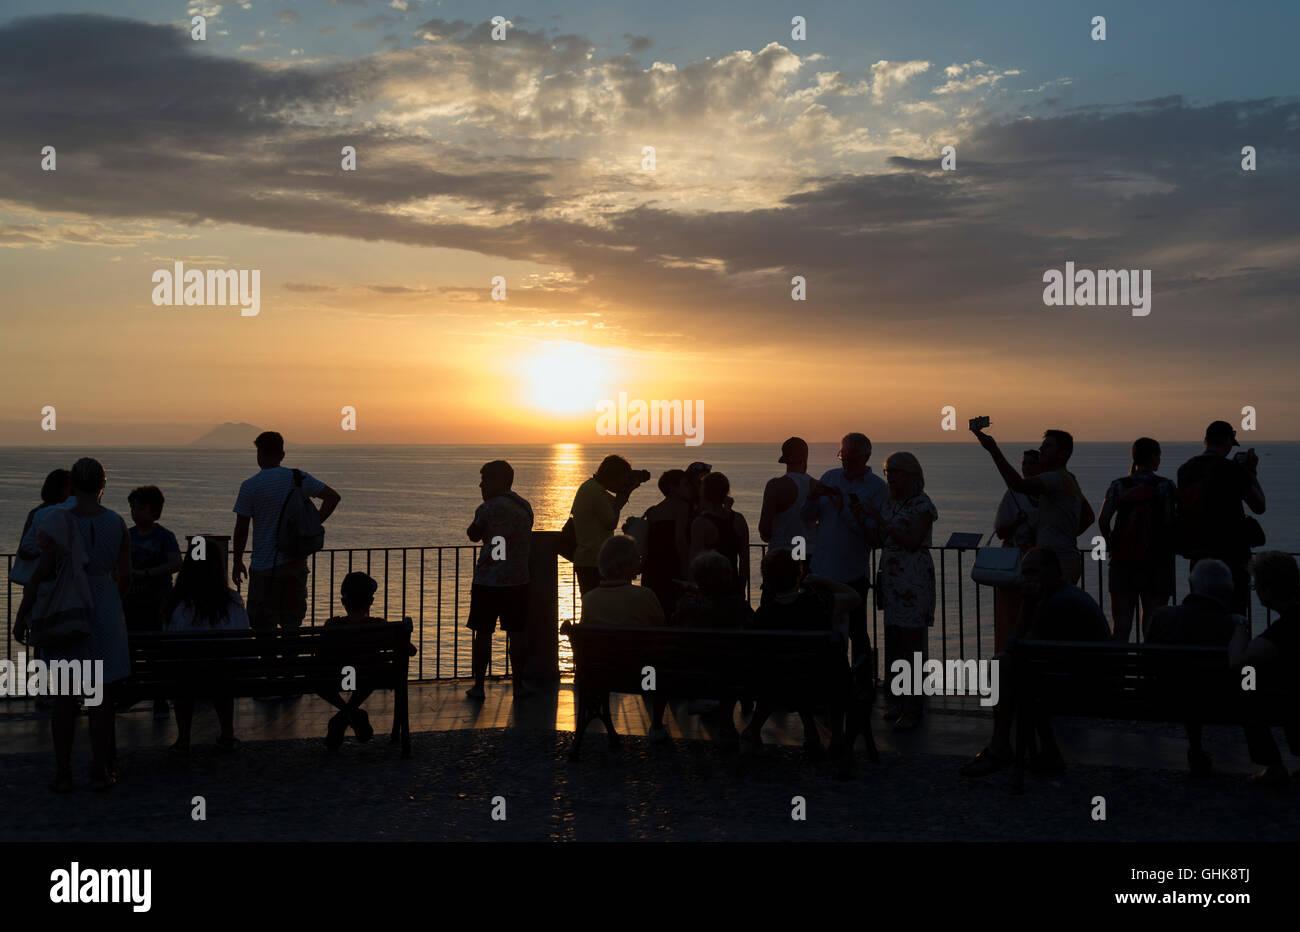 Sunset over Tyrrhenian Sea, Tropea, Calabria, Italy Stock Photo